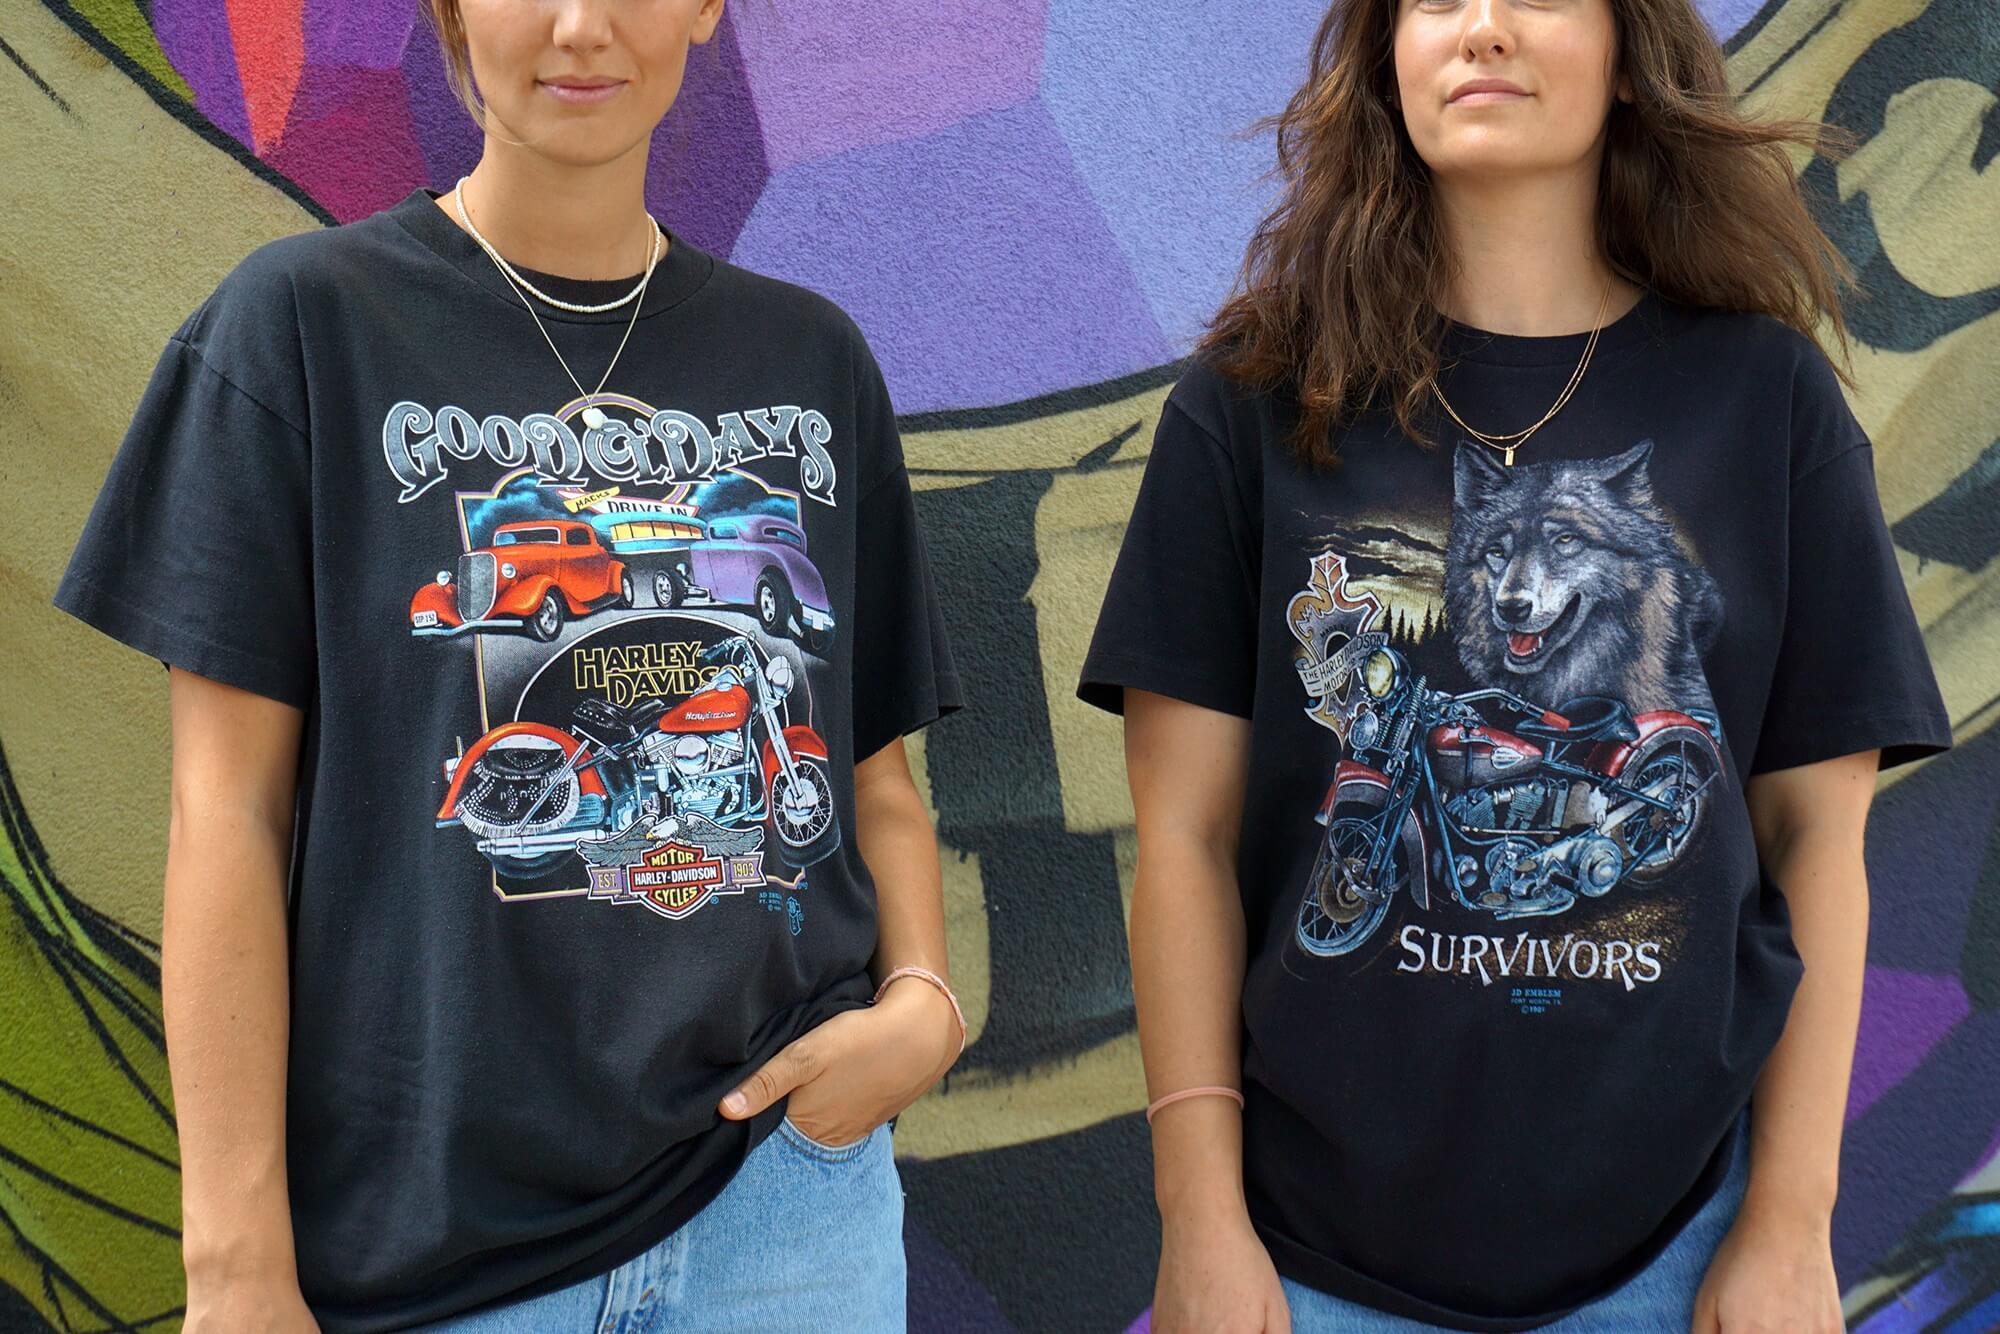 Originale Harley Davidson Vintage Shirts aus den 90er Jahren 3D Emblem